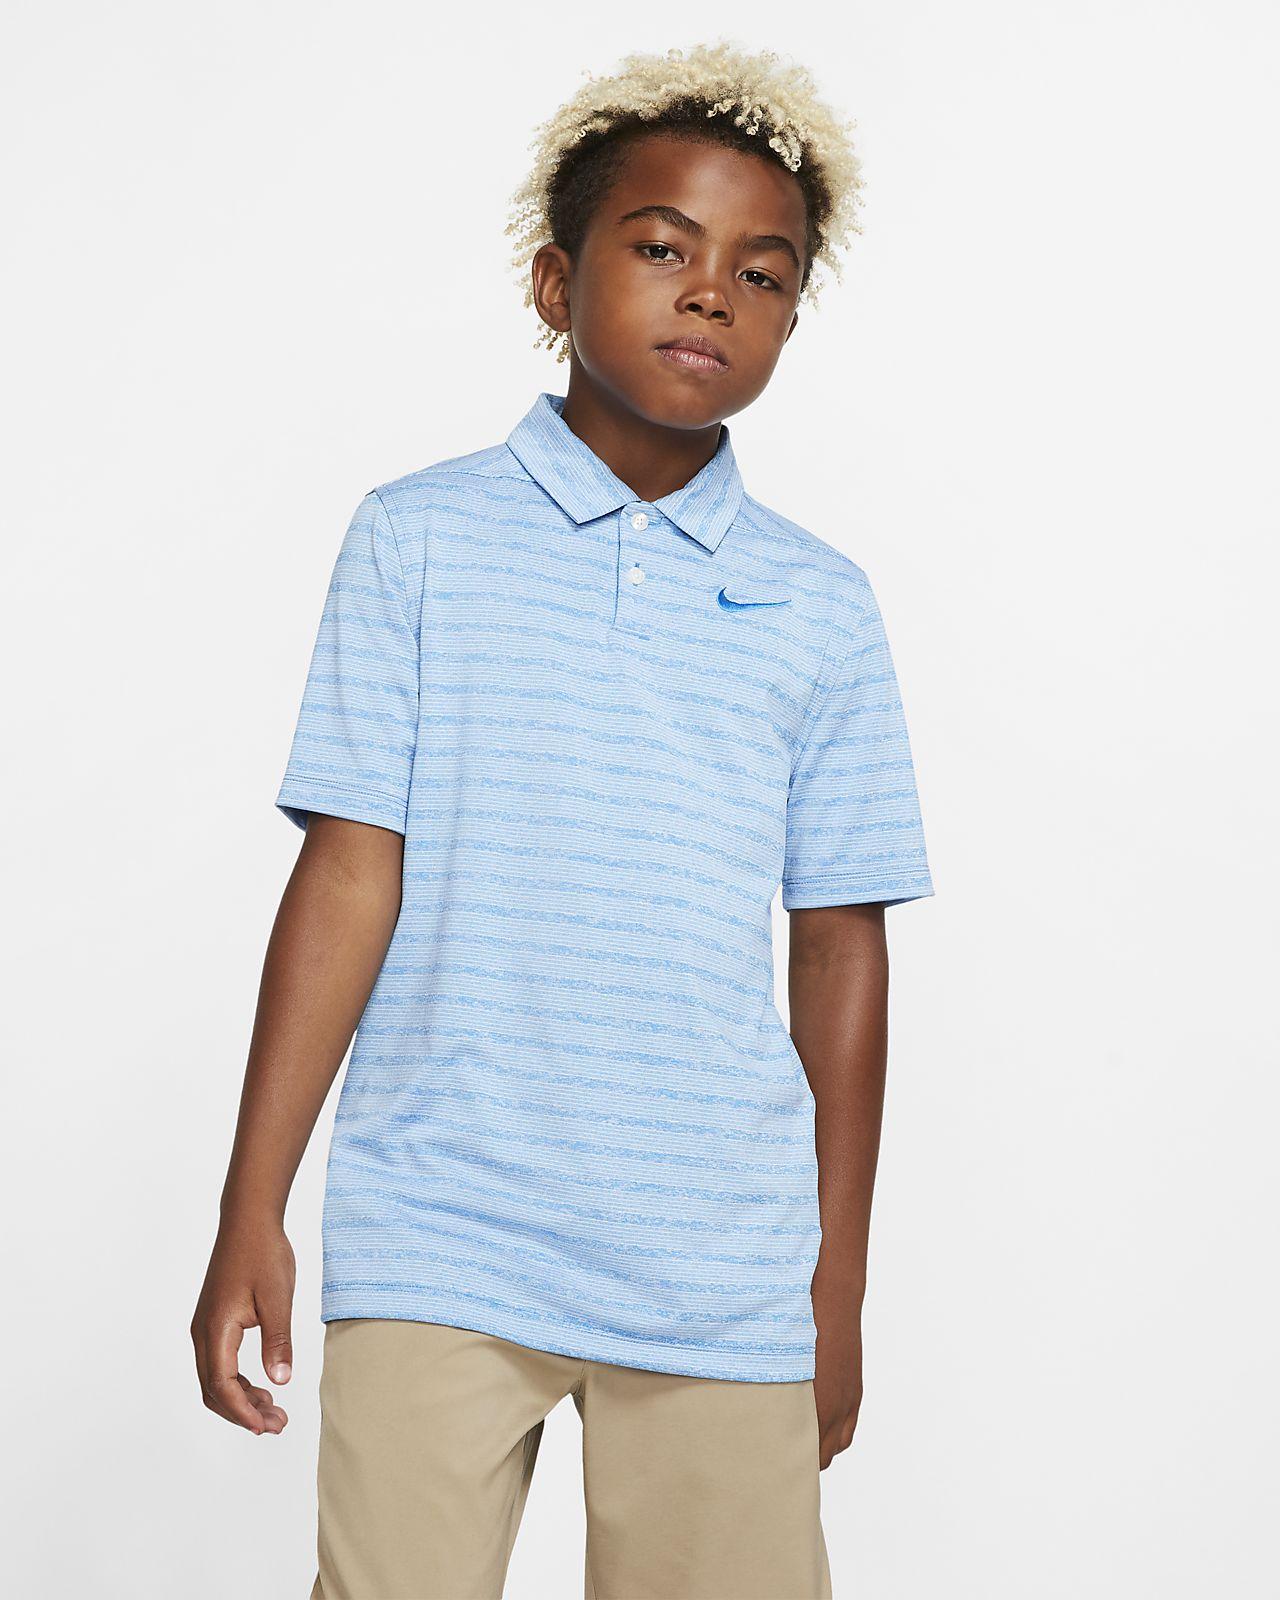 Nike Dri-FIT Polo de ratlles de golf - Nen